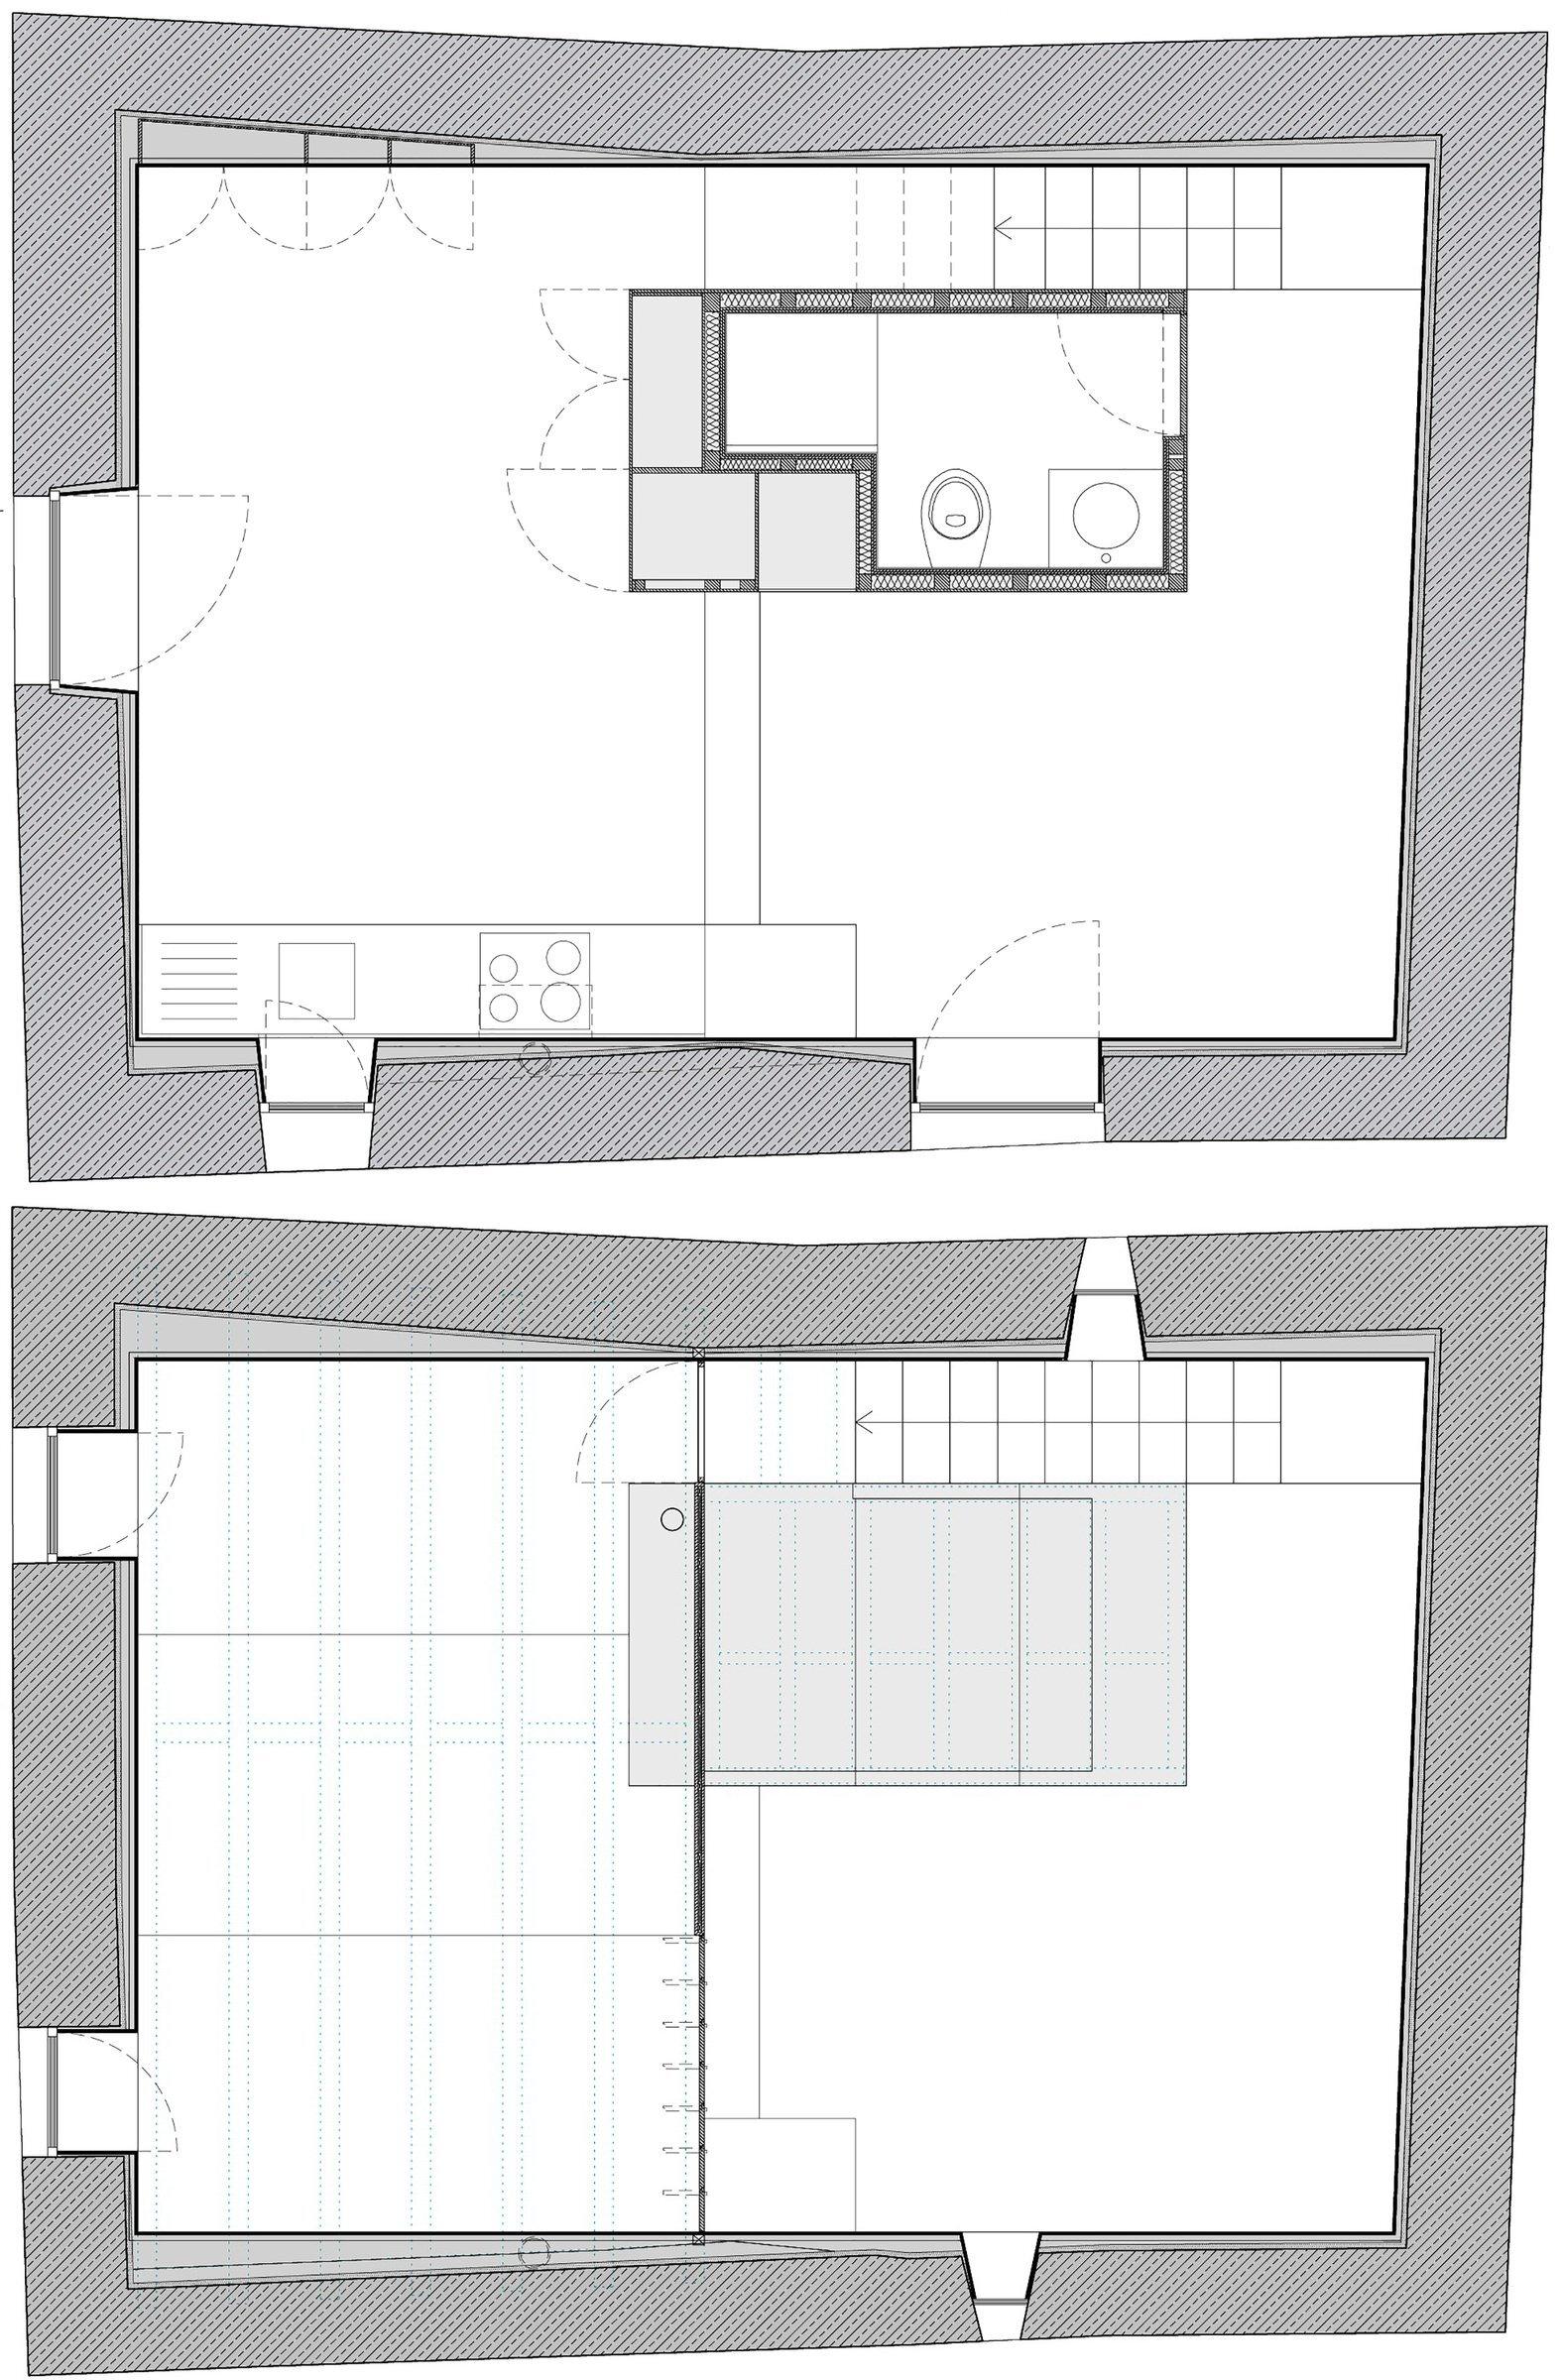 Nogueiras House - Sofia Parente + André Delgado - Portugal - Floor Plan - Humble Homes